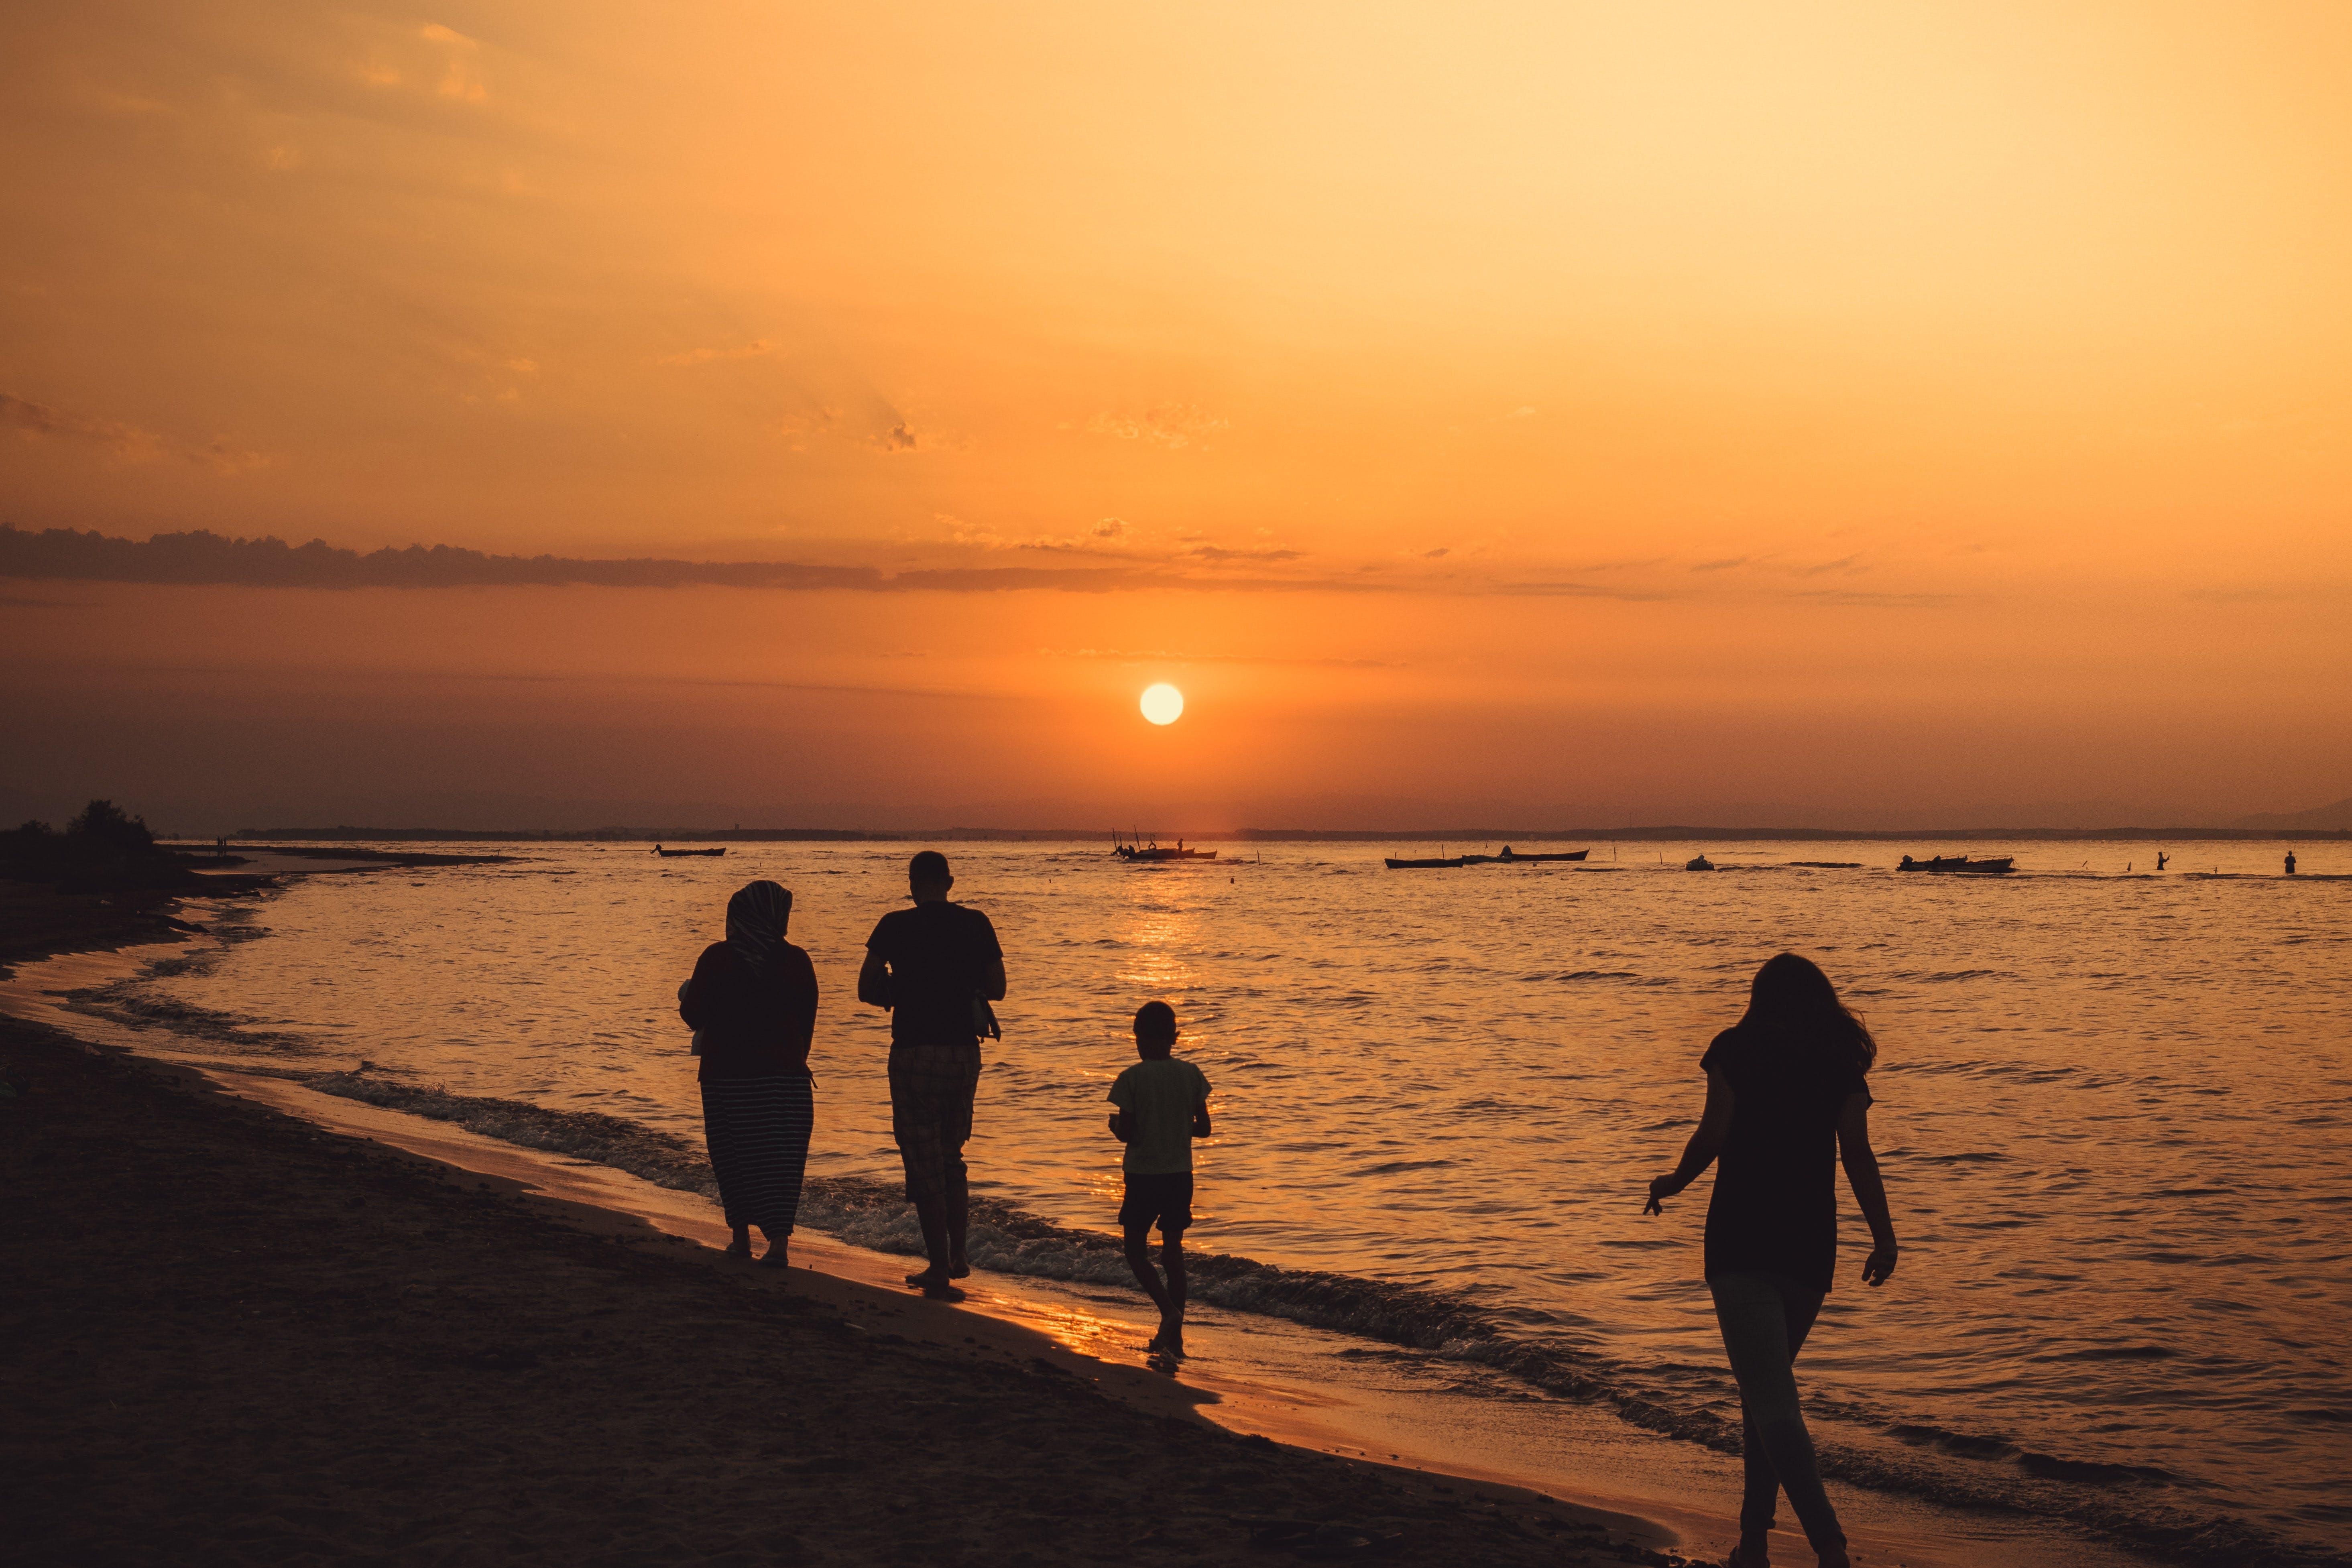 Silhouette Of People Walking On Seashore During Sunset